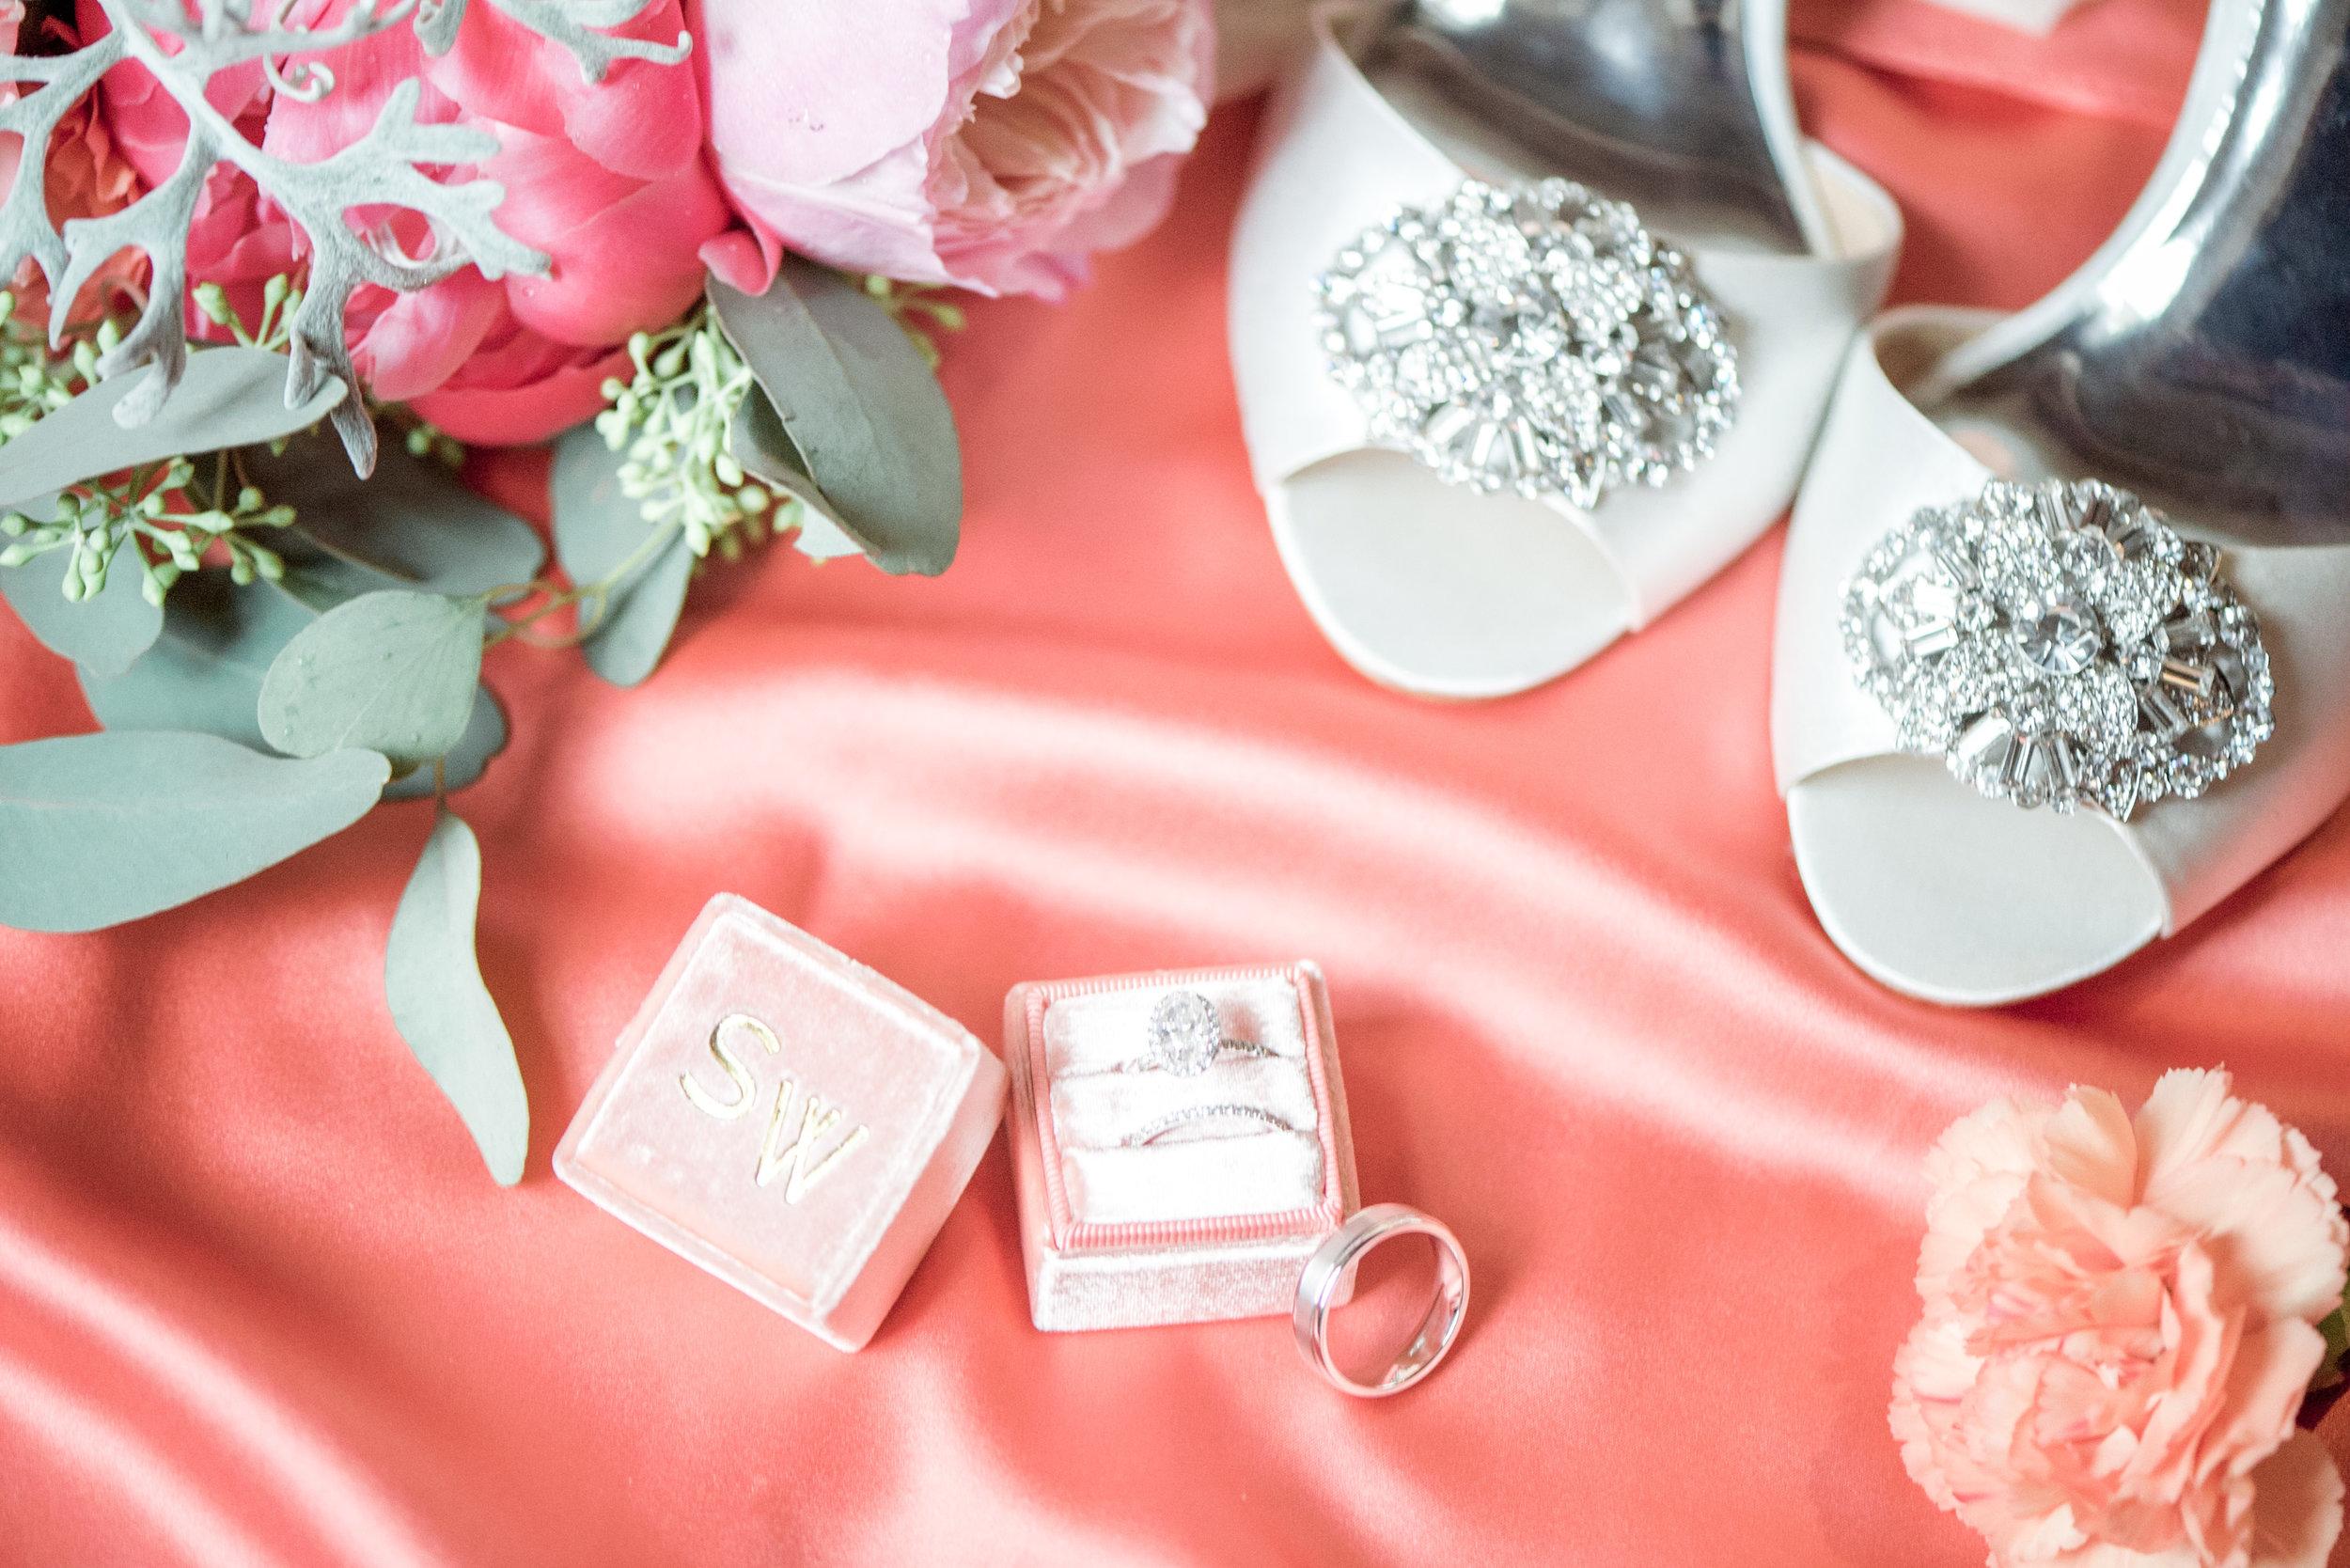 charleston elopement planners, scarlet plan & design, coral, tangerine, hot pink, peach intimate wedding (33).jpg